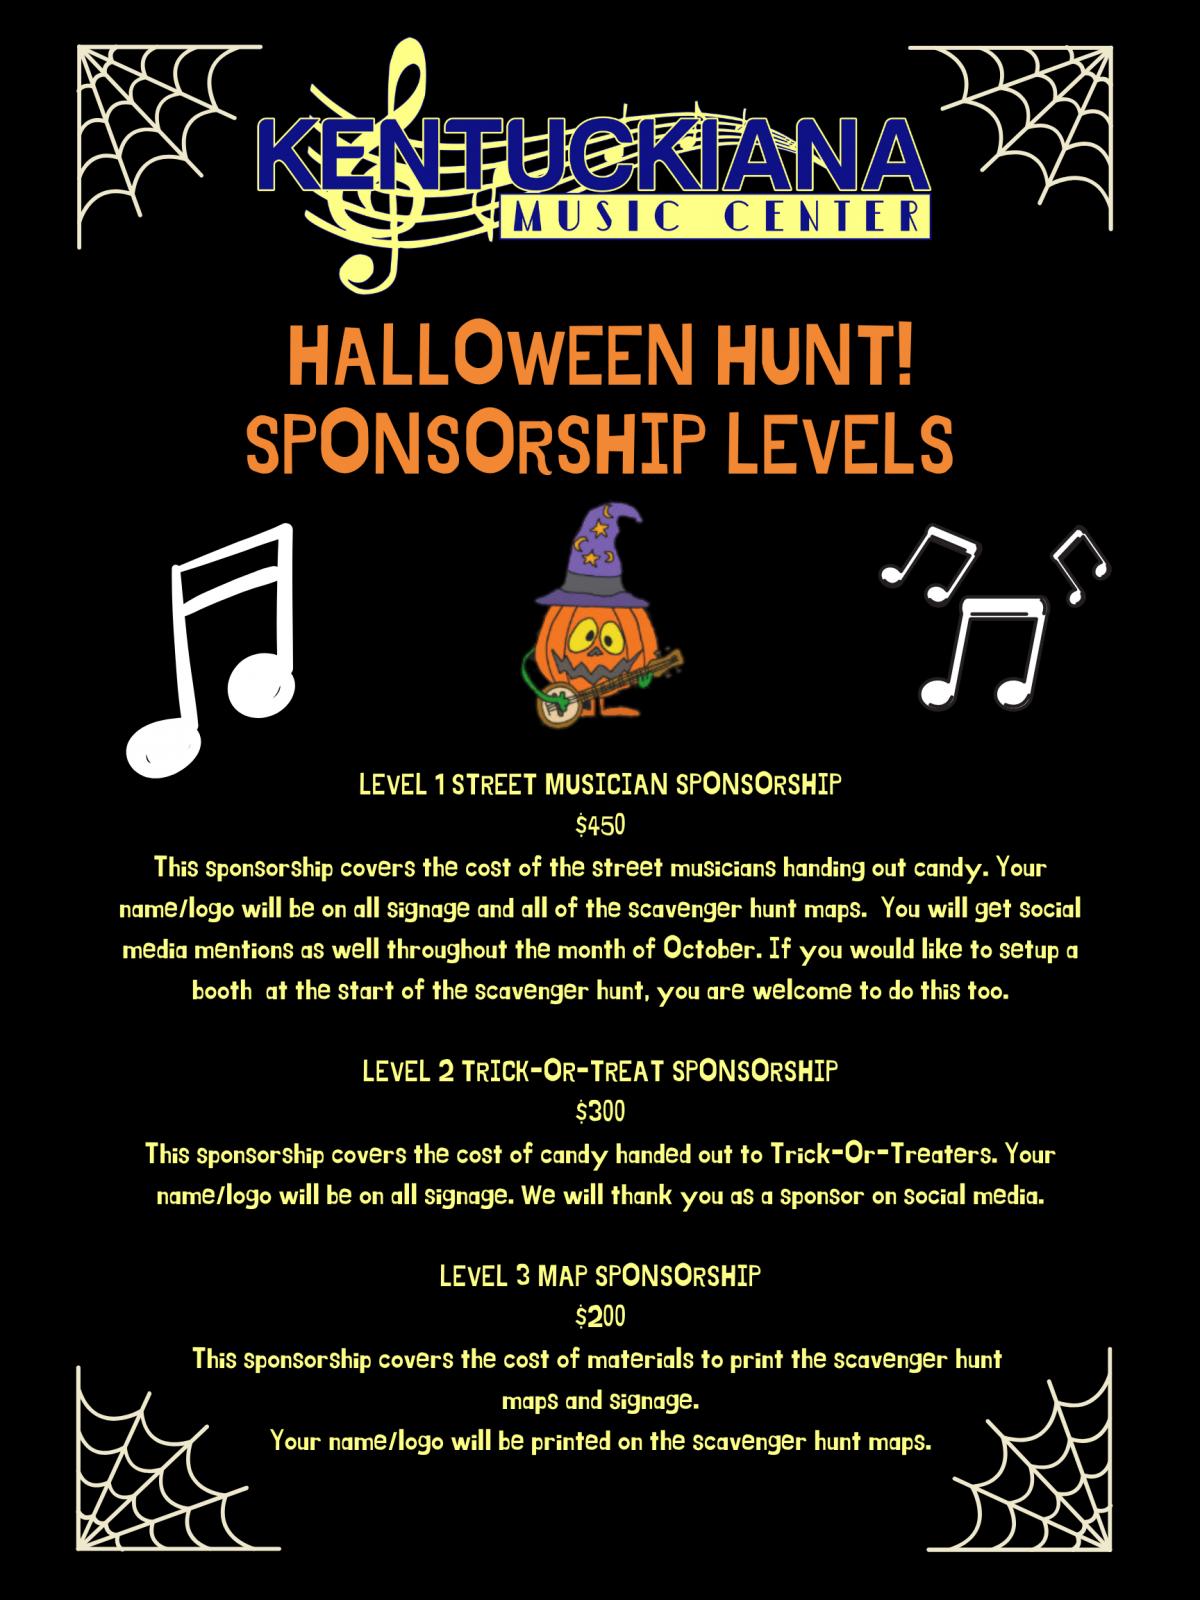 Halloween Hunt Sponsorship